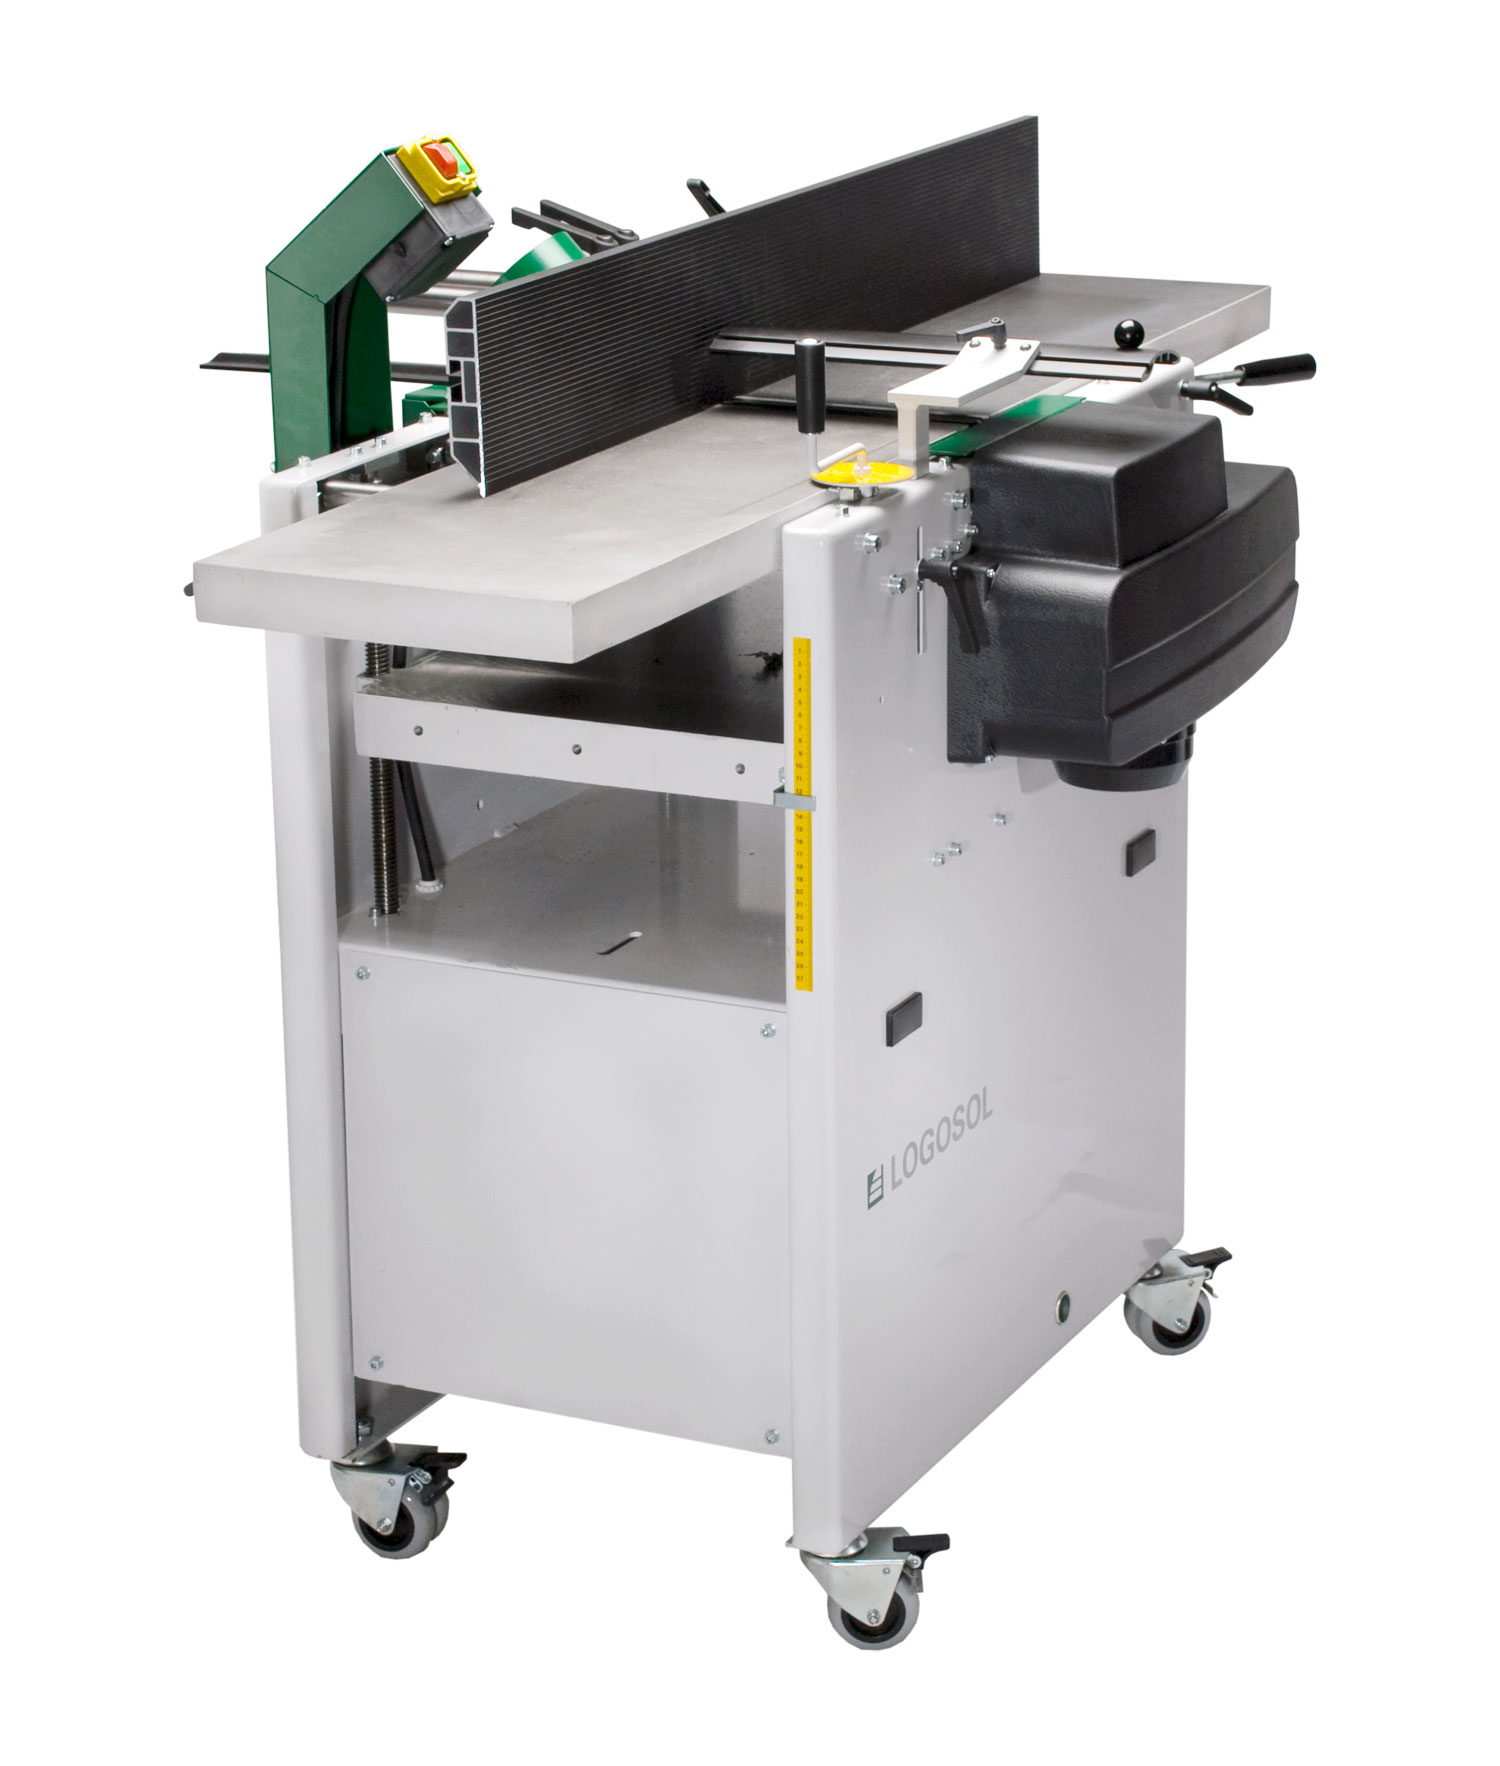 Sawmill Machinery - Jointer/Planer thicknesser H410 - Logosol